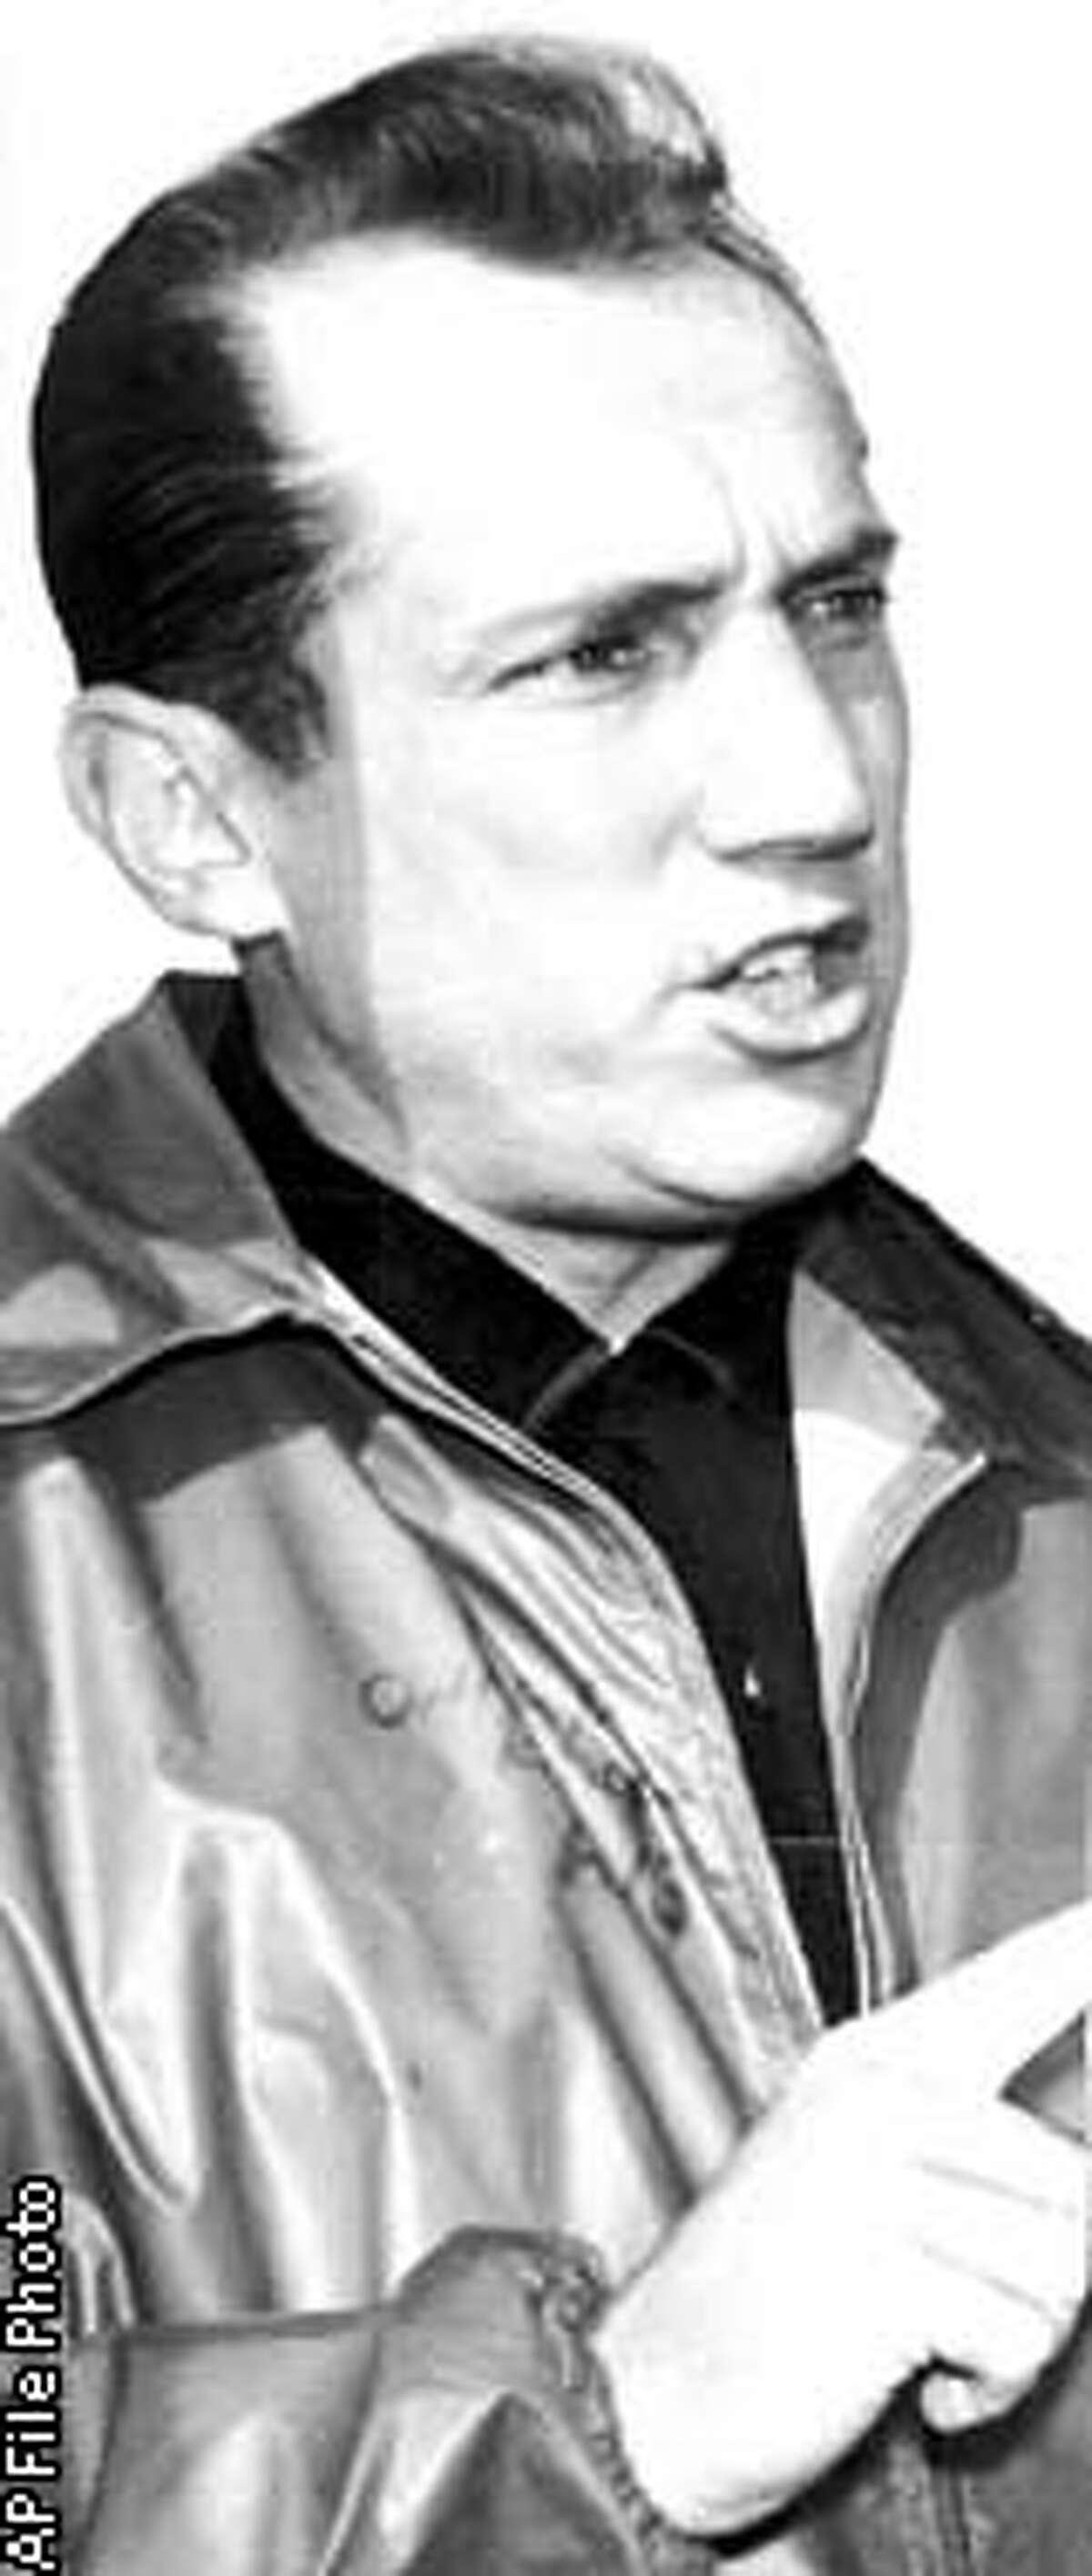 AL DAVIS, HEAD COACH OF THE AMERICAN FOOTBALL LEAGUE'S OAKLAND RAIDERS, HAS BEEN NAMED